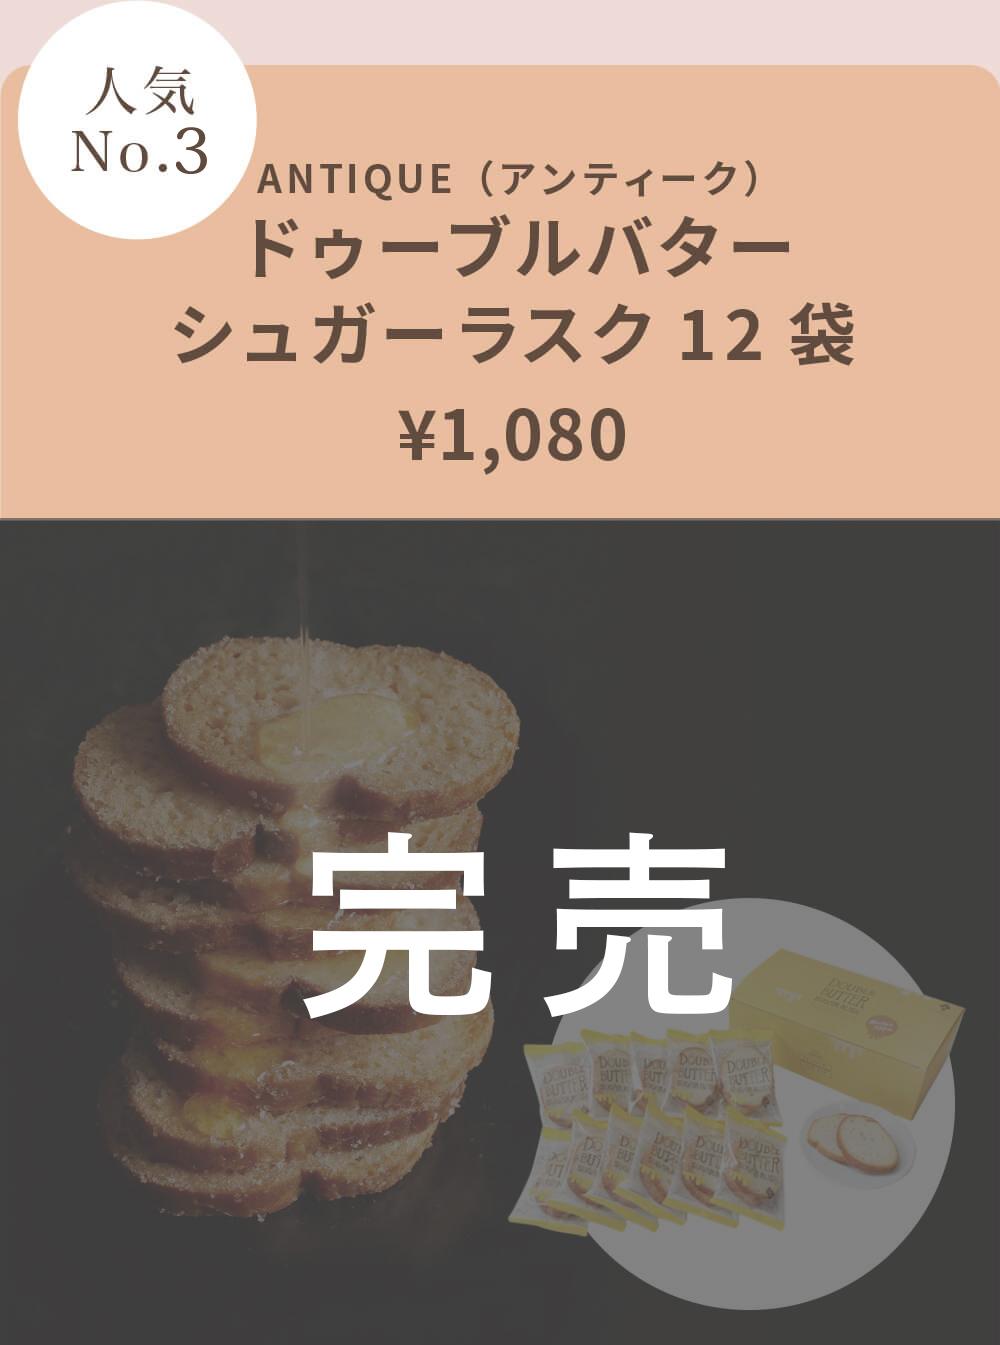 ANTIQUE(アンティーク) ドゥーブルバターシュガーラスク12袋 ¥1,080